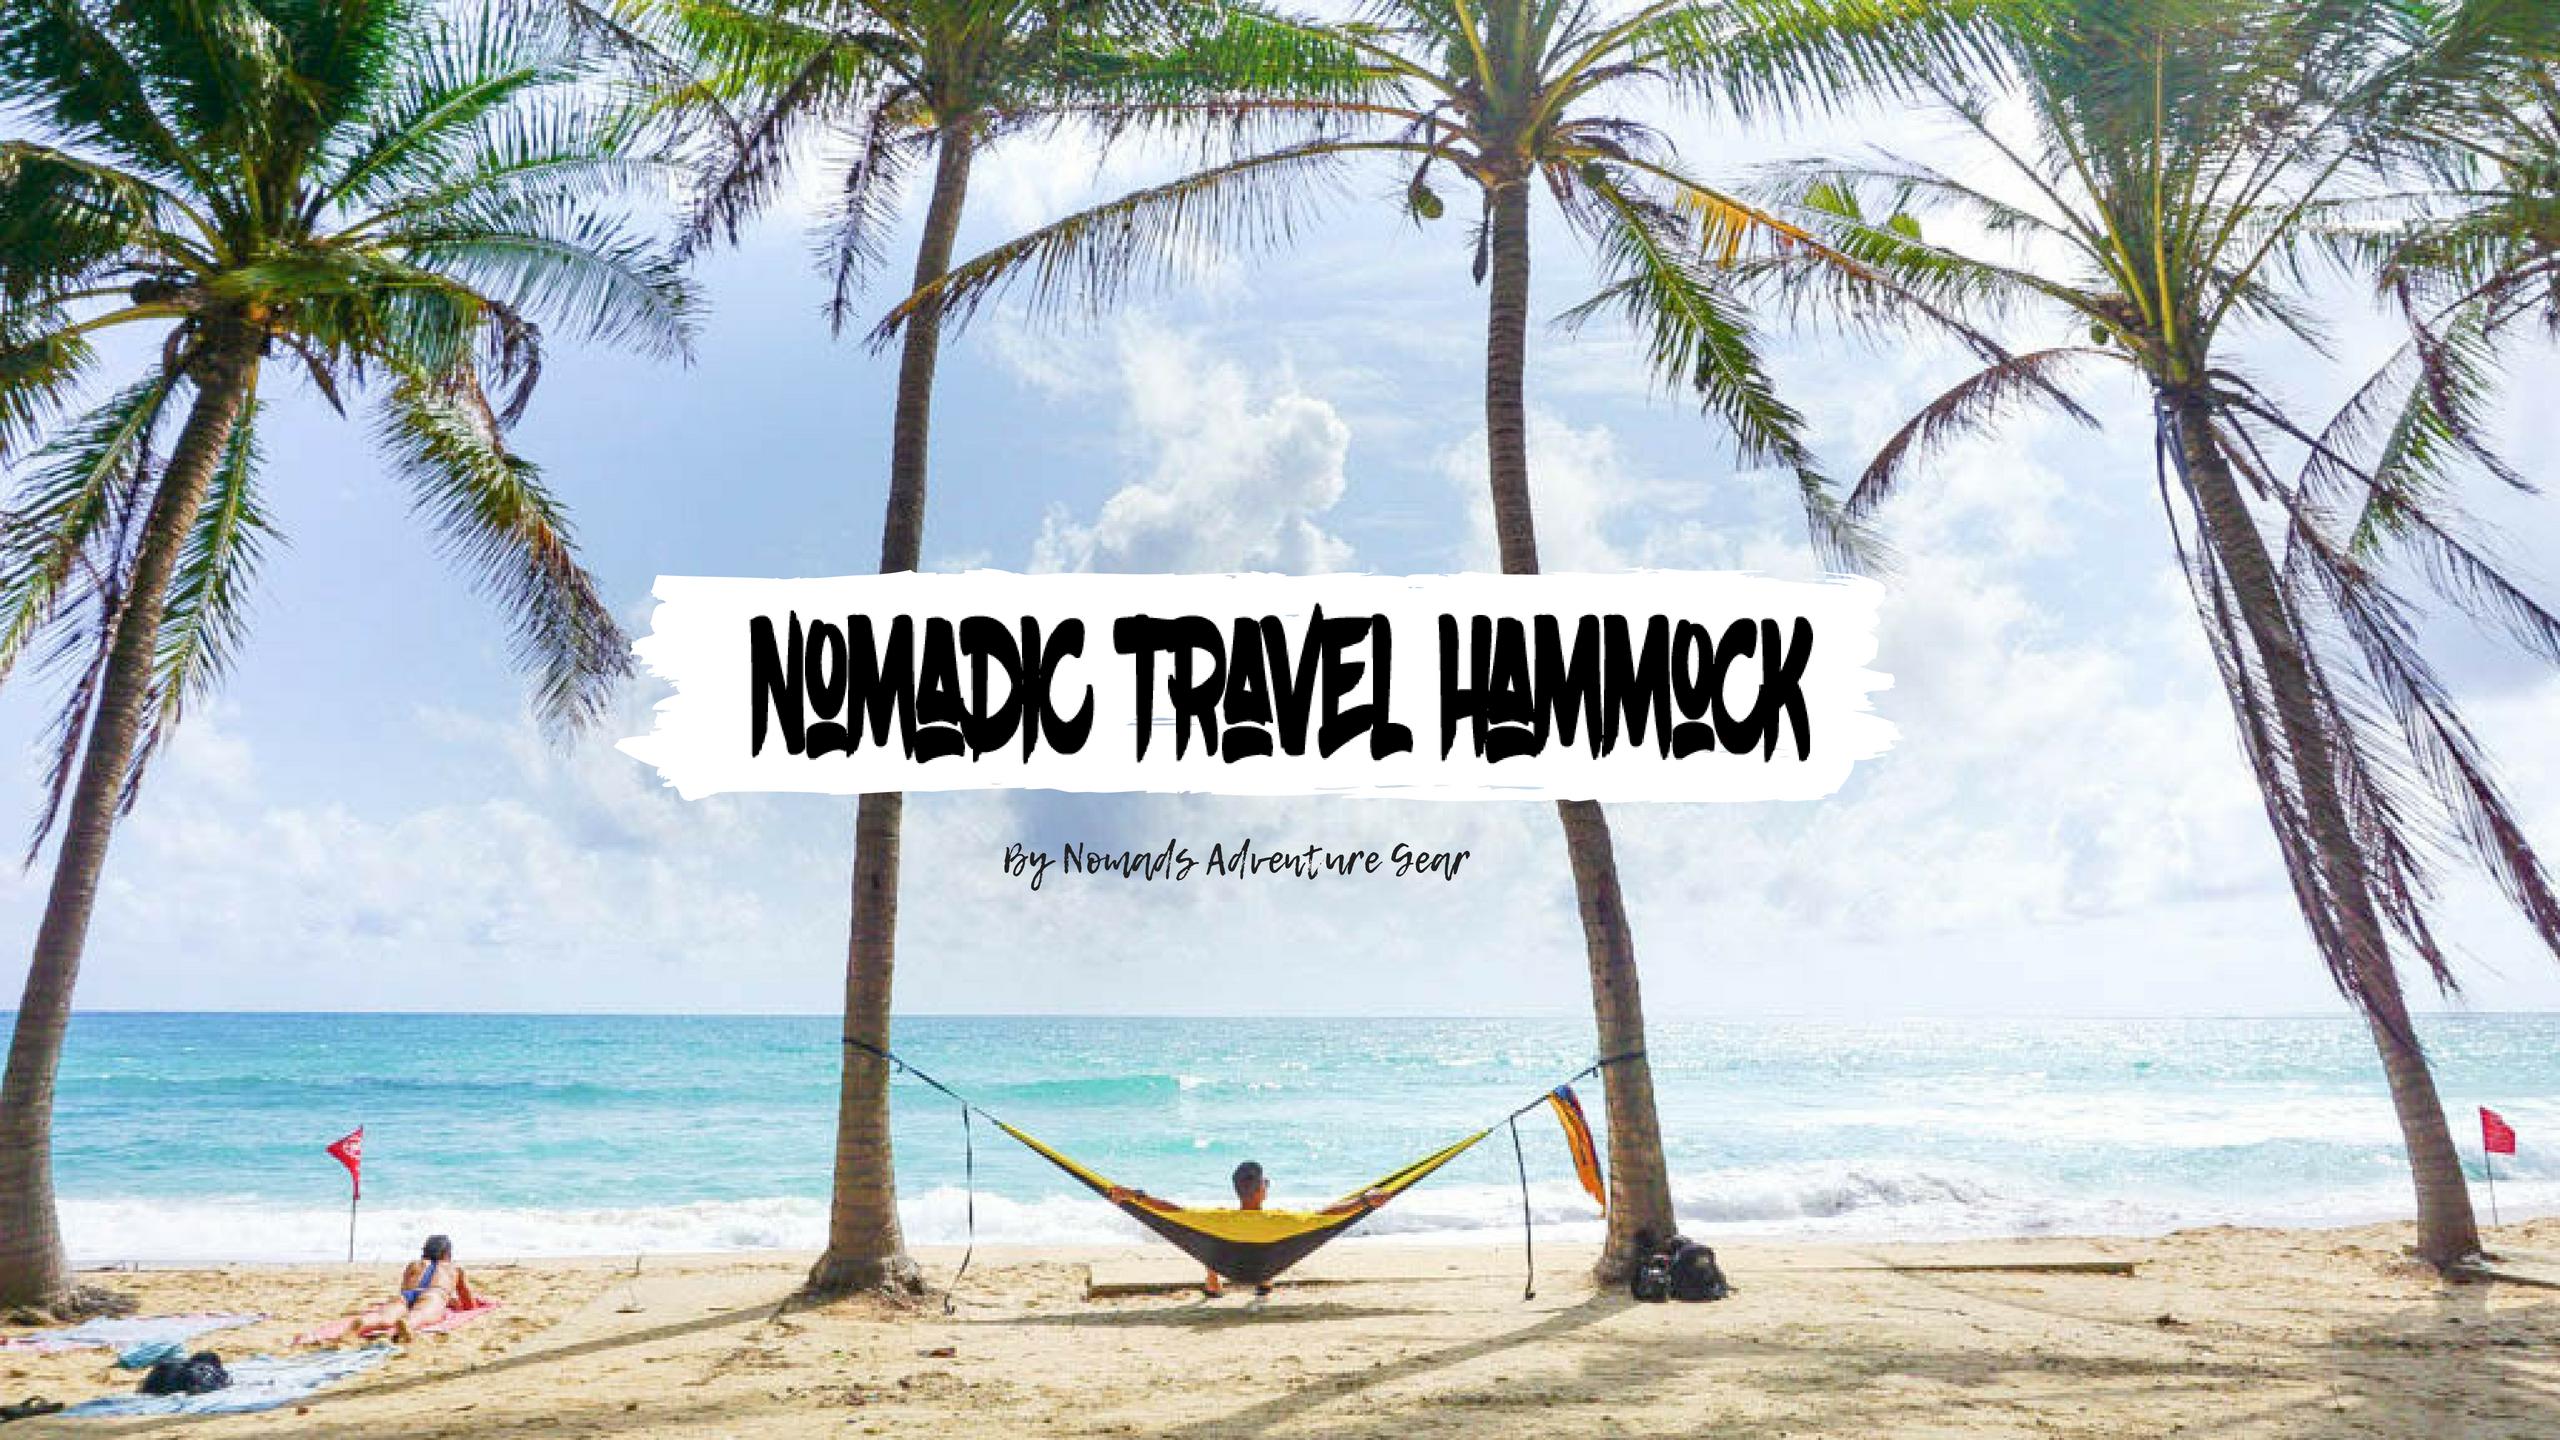 Nomadic Travel Hammock